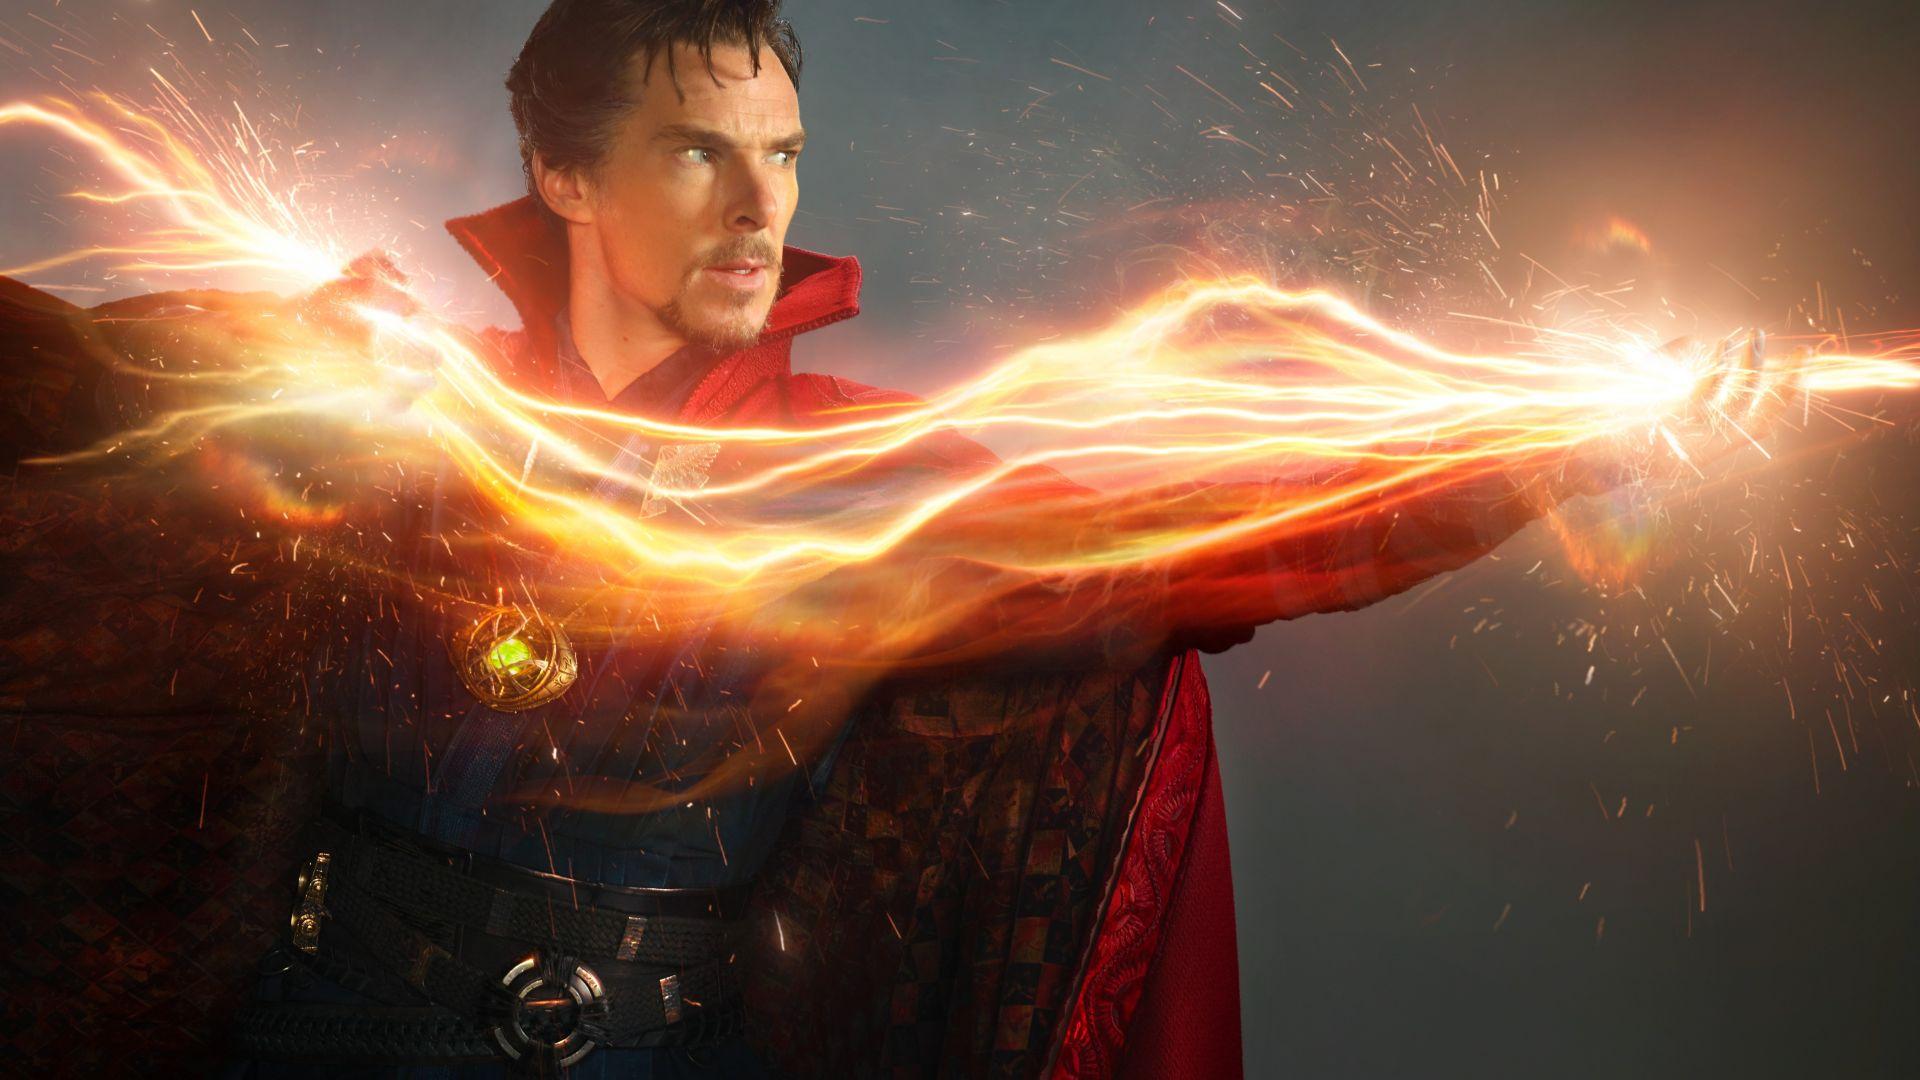 Wallpaper Doctor Strange Benedict Cumberbatch Best Movies Movie